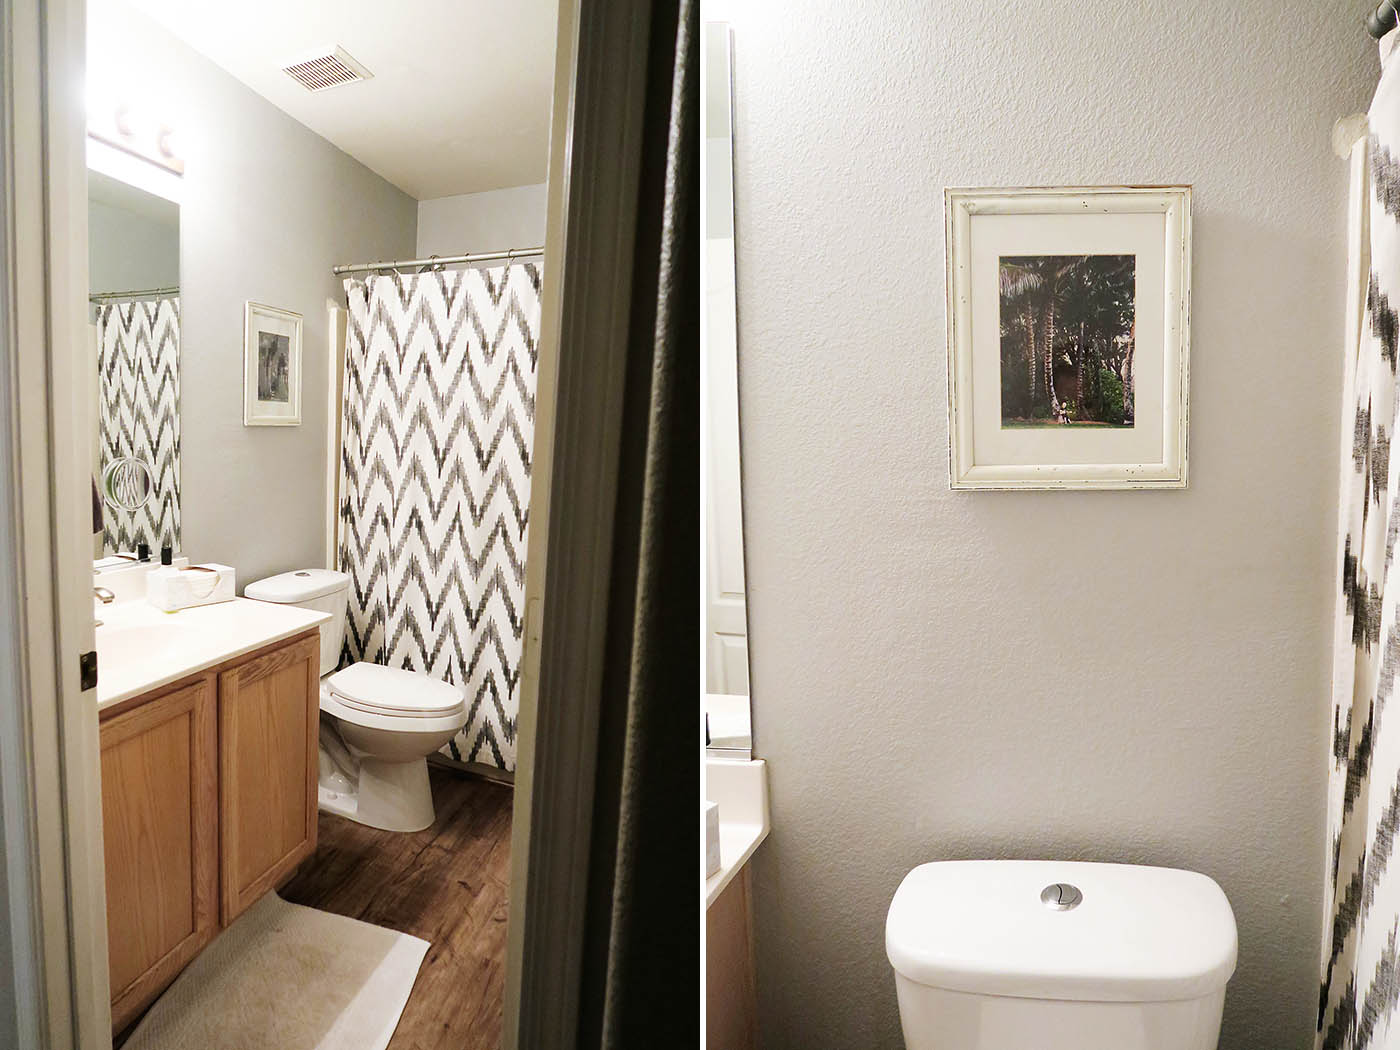 Holiday bathroom decor - before